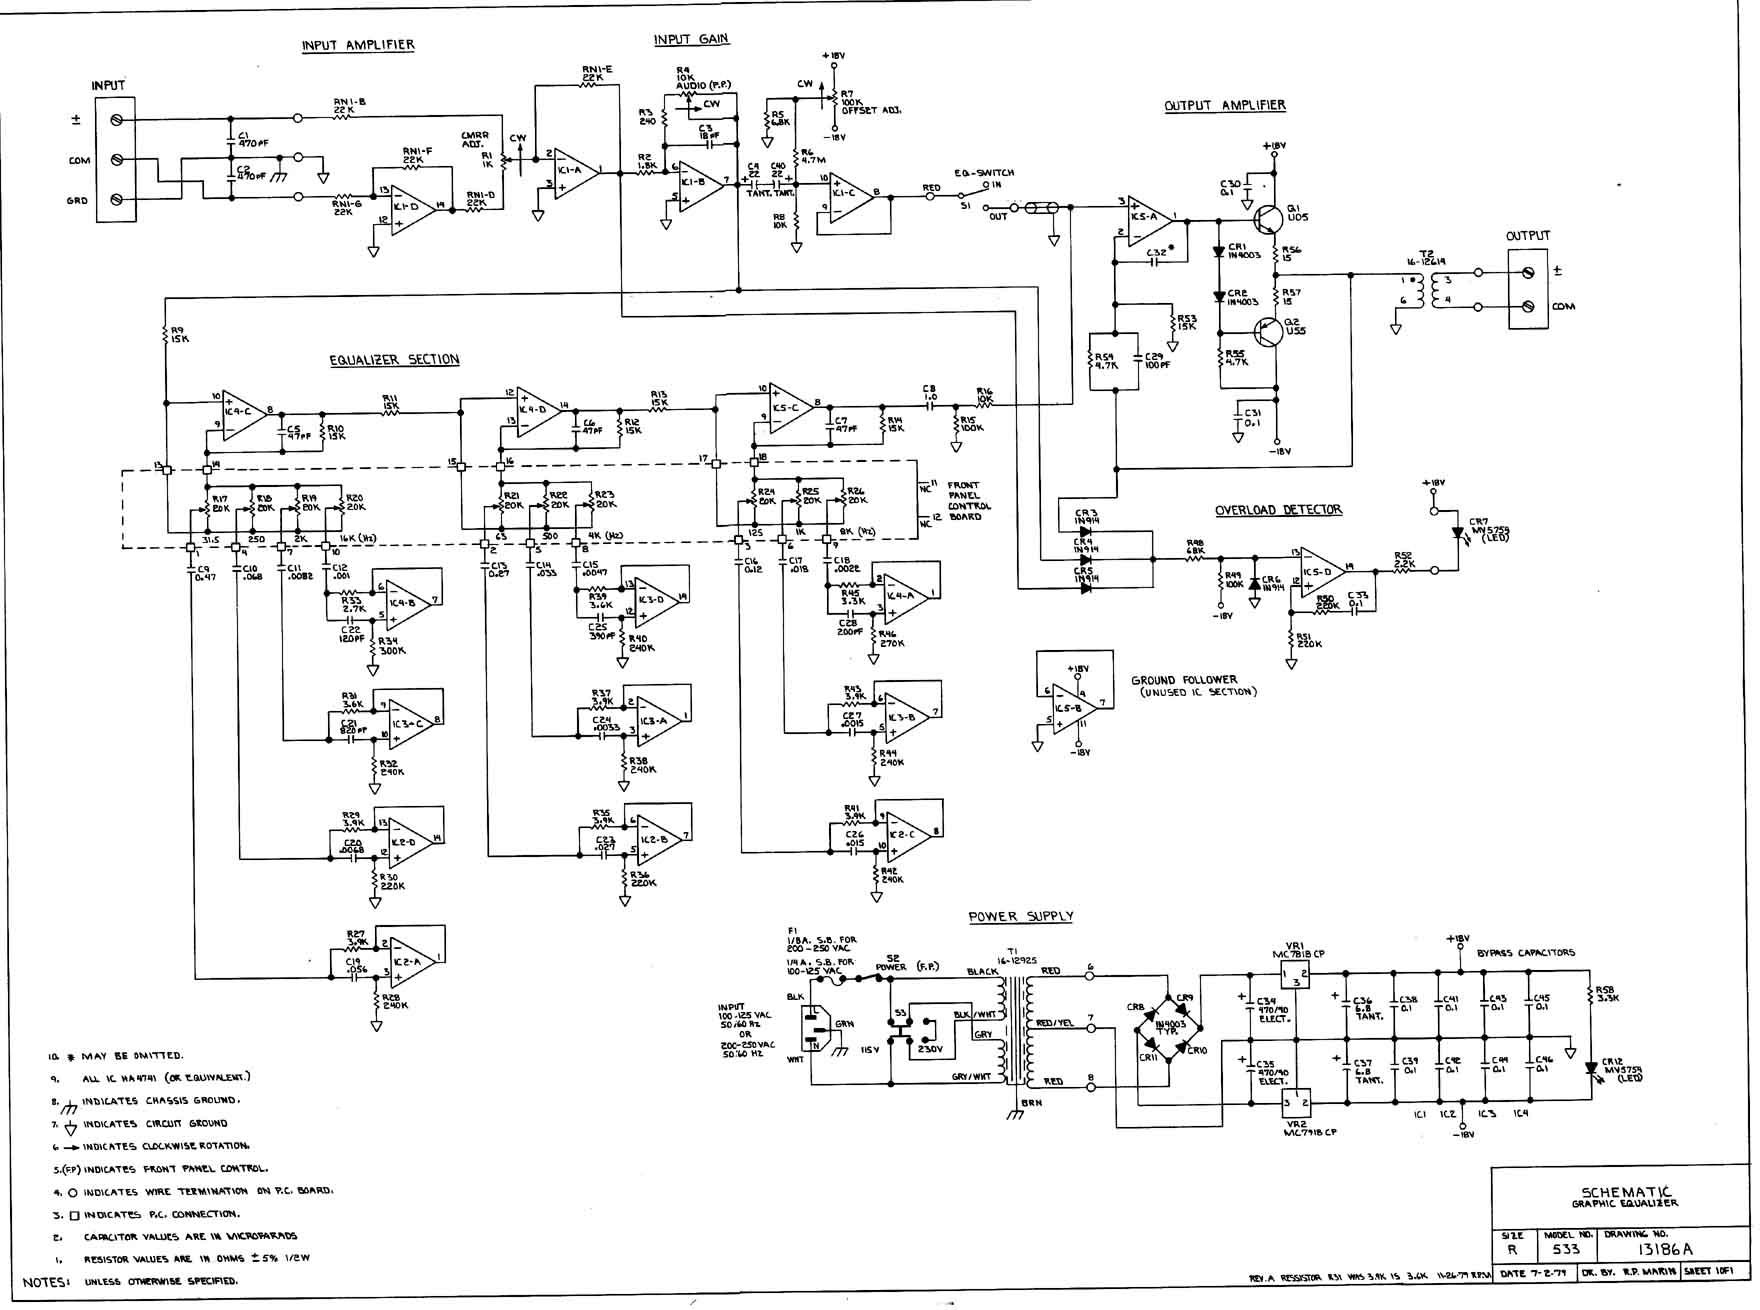 Electronics Wiring Diagrams Schematic : Urei equalizer schematic